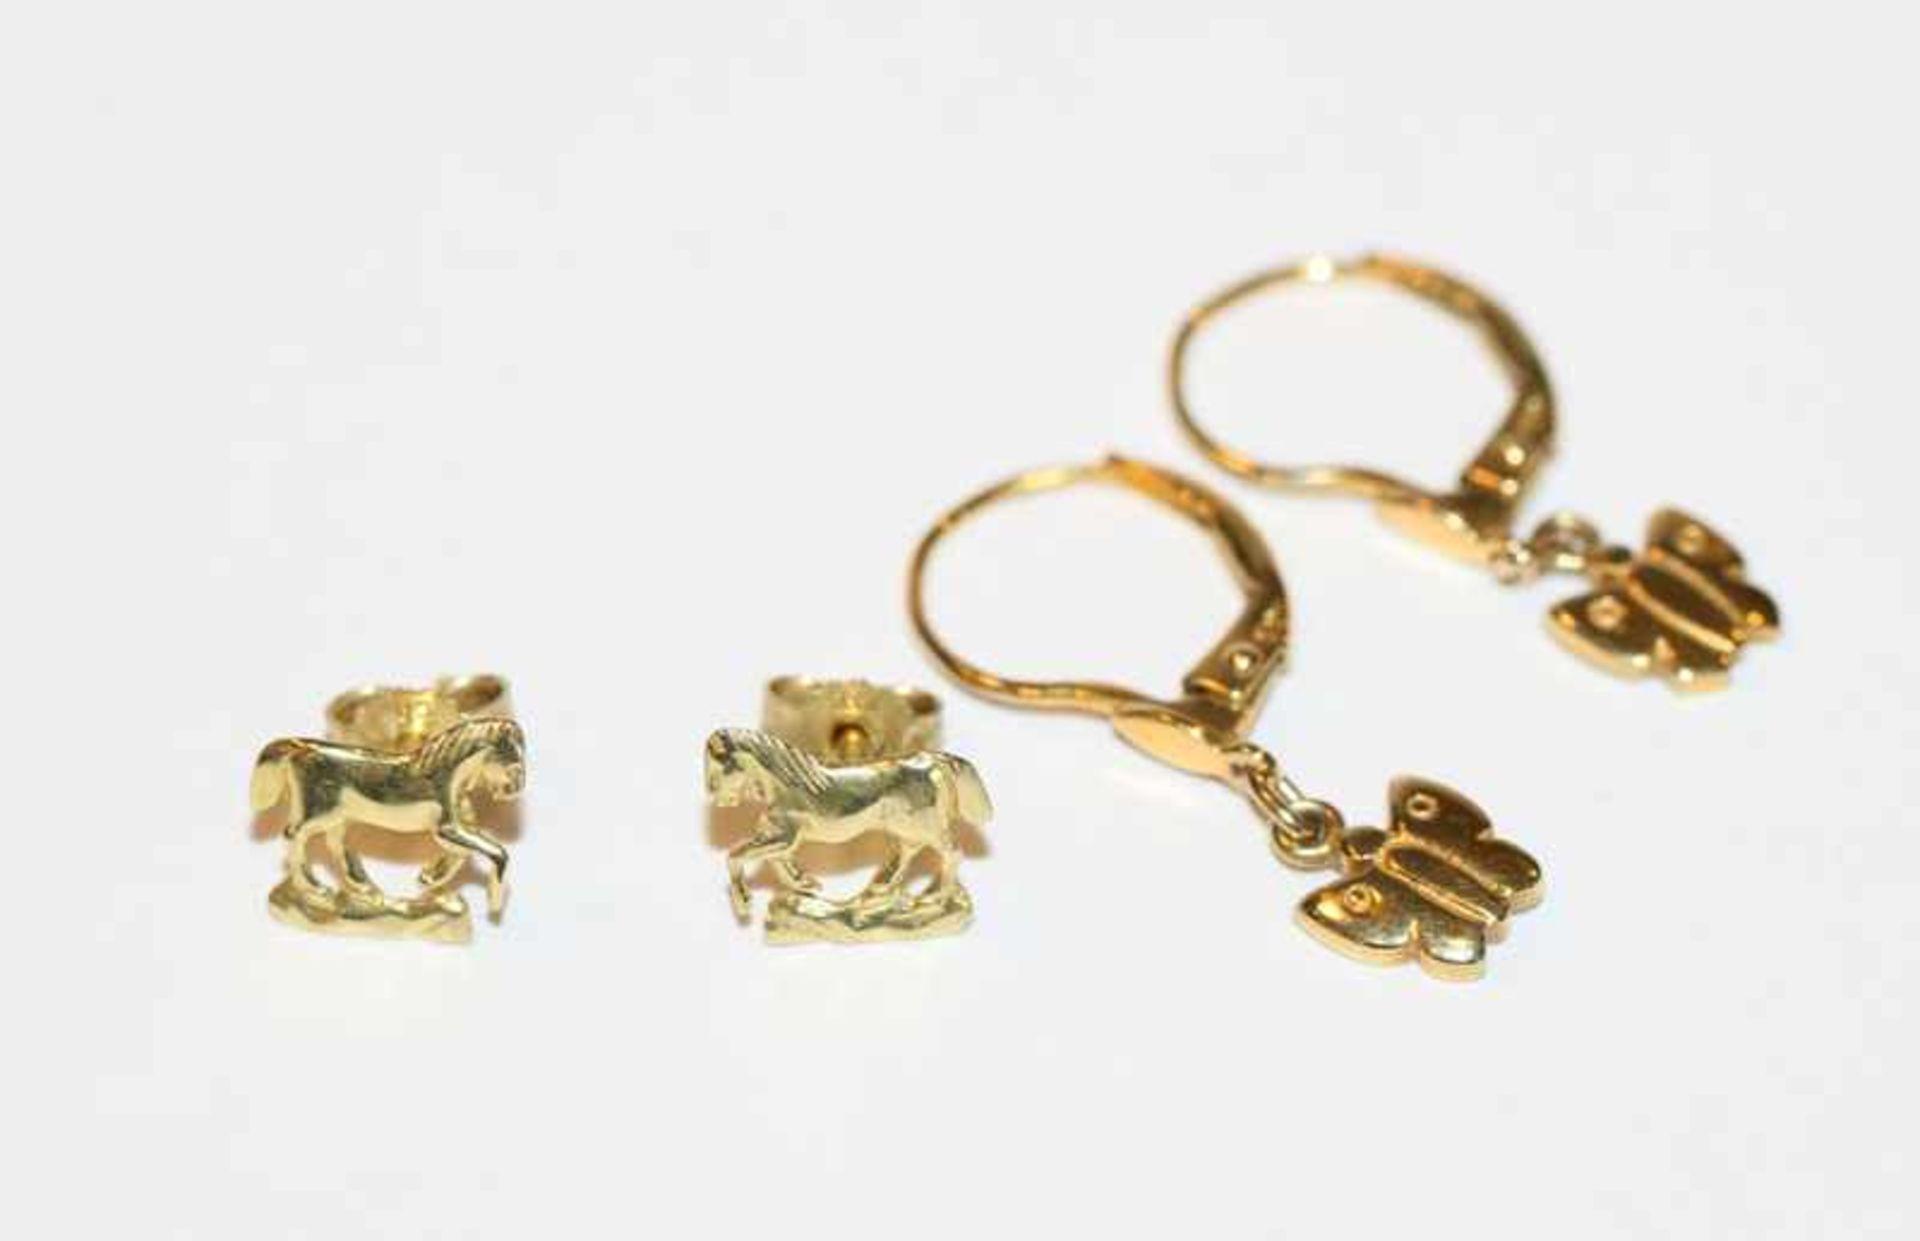 Los 29 - Paar 8 k Gelbgold Kinder-Ohrstecker 'Pferd' und Paar 8 k Gelbgold Kinder-Ohrhänger 'Schmetterling'